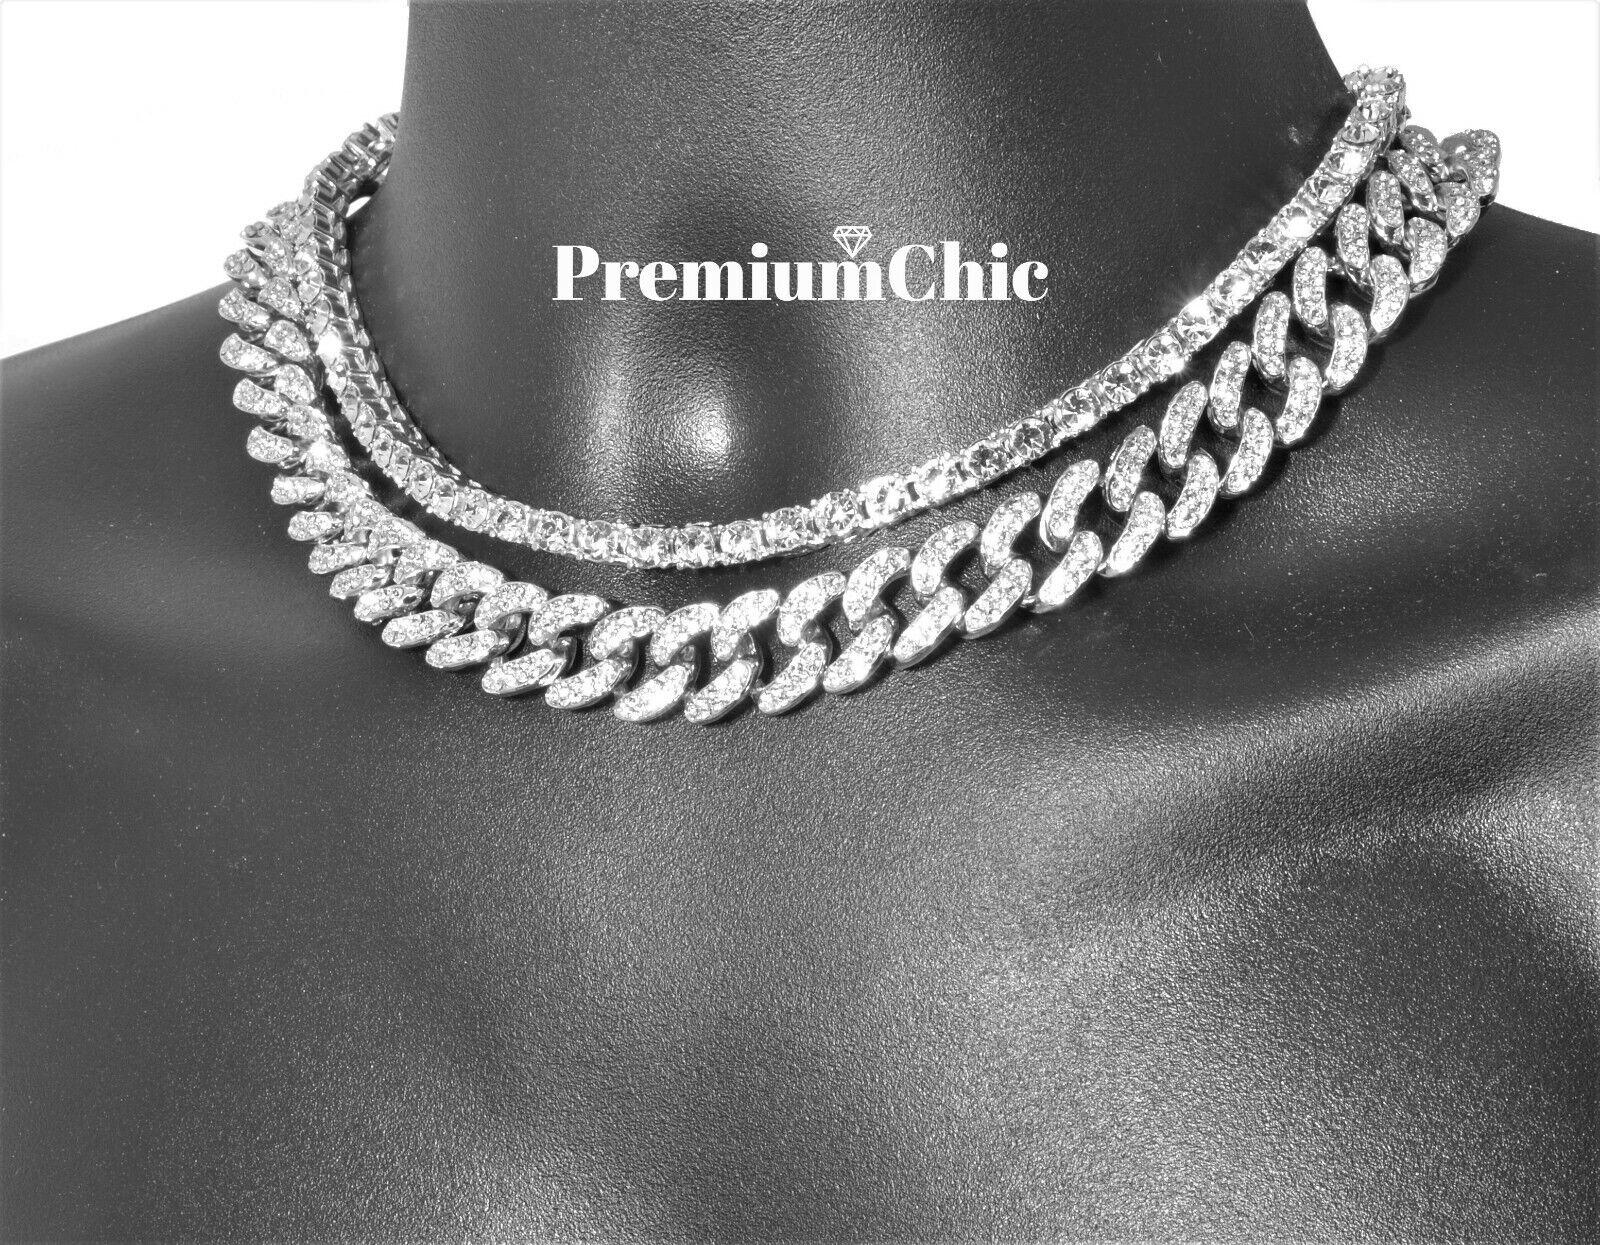 Jewellery - Tennis Chain + Miami Cuban Choker Hip Hop Men Necklace 14k Gold / Silver Plated